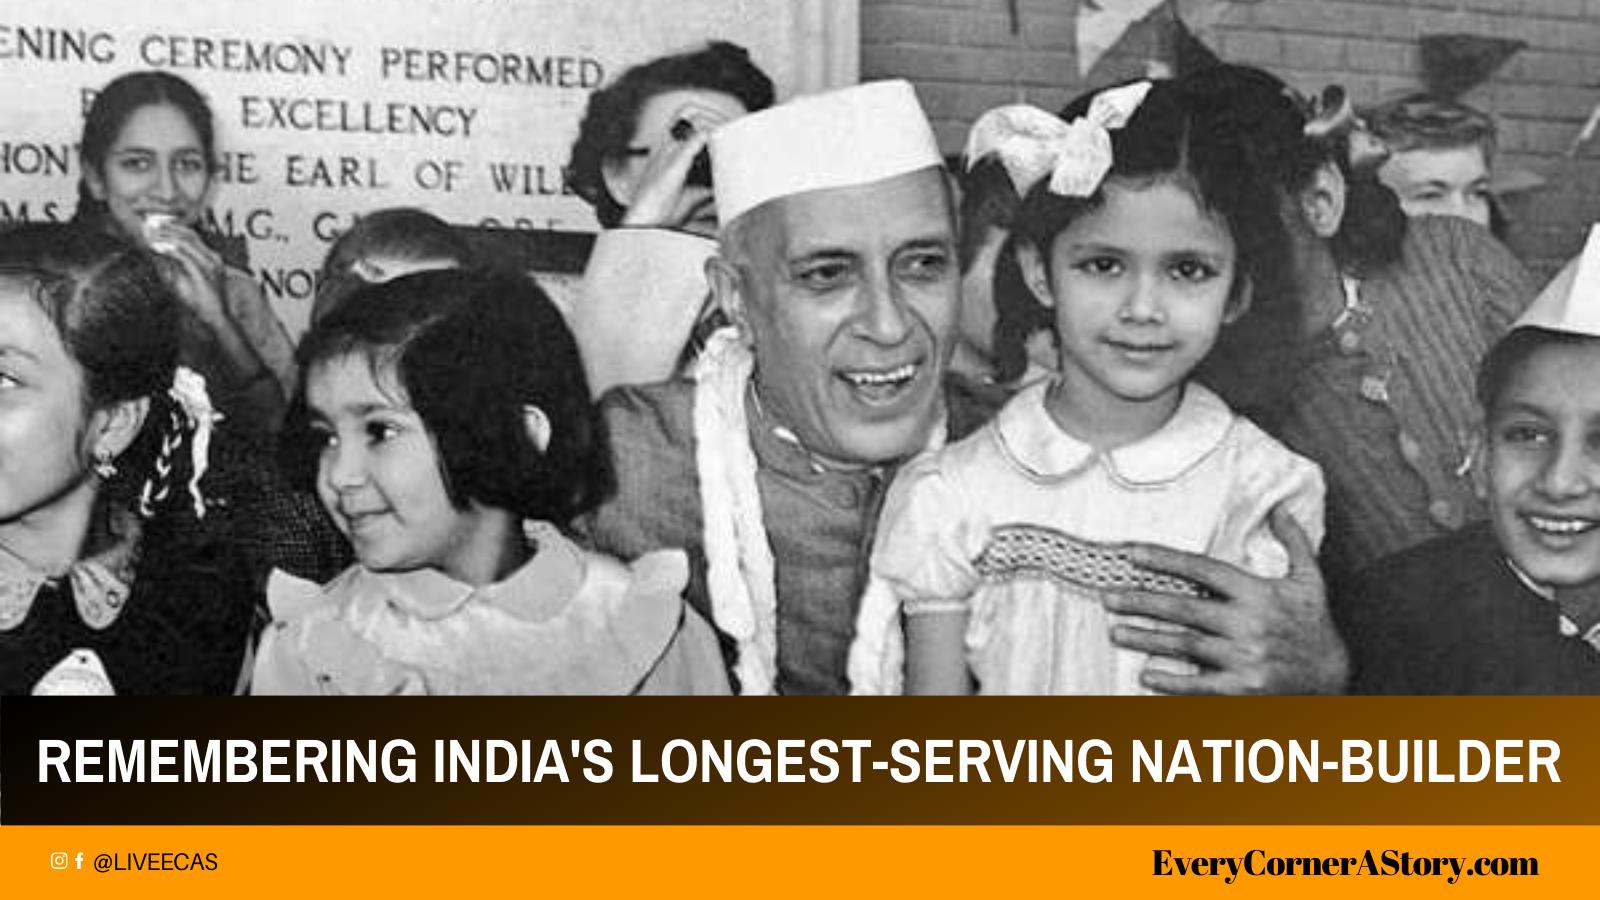 jawaharlal-nehru-works-pillars-modern-india-dams-education-nation-builder-puneet-bawa-ecas-india-every-corner-a-story